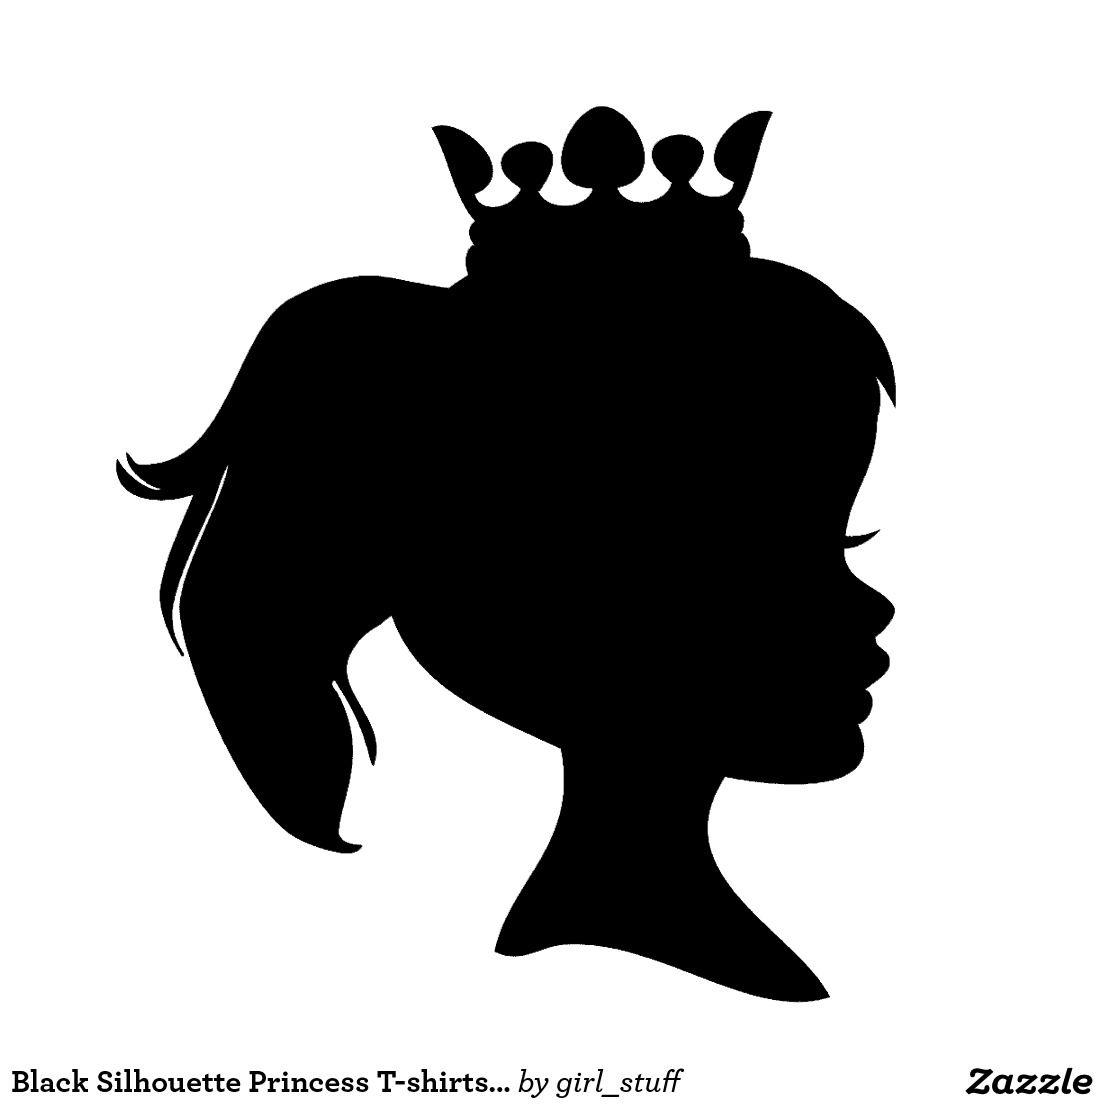 silhouette girl tiara - Google Search   3 stencil   Pinterest ...